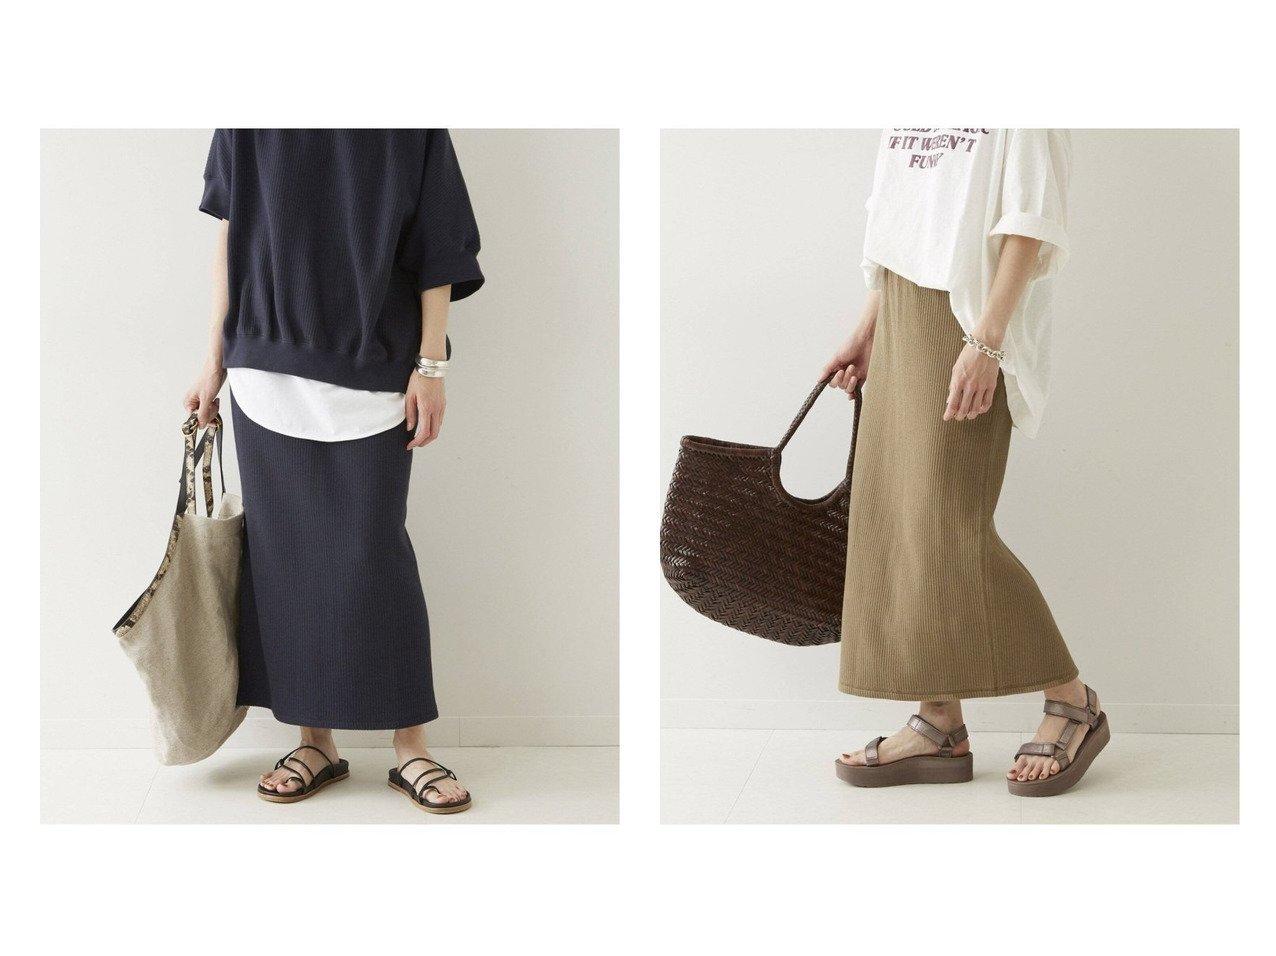 【FRAMeWORK/フレームワーク】のラゲットリブスカート2 【スカート】おすすめ!人気、トレンド・レディースファッションの通販 おすすめで人気の流行・トレンド、ファッションの通販商品 メンズファッション・キッズファッション・インテリア・家具・レディースファッション・服の通販 founy(ファニー) https://founy.com/ ファッション Fashion レディースファッション WOMEN スカート Skirt NEW・新作・新着・新入荷 New Arrivals 2021年 2021 2021春夏・S/S SS/Spring/Summer/2021 S/S・春夏 SS・Spring/Summer 再入荷 Restock/Back in Stock/Re Arrival |ID:crp329100000036706